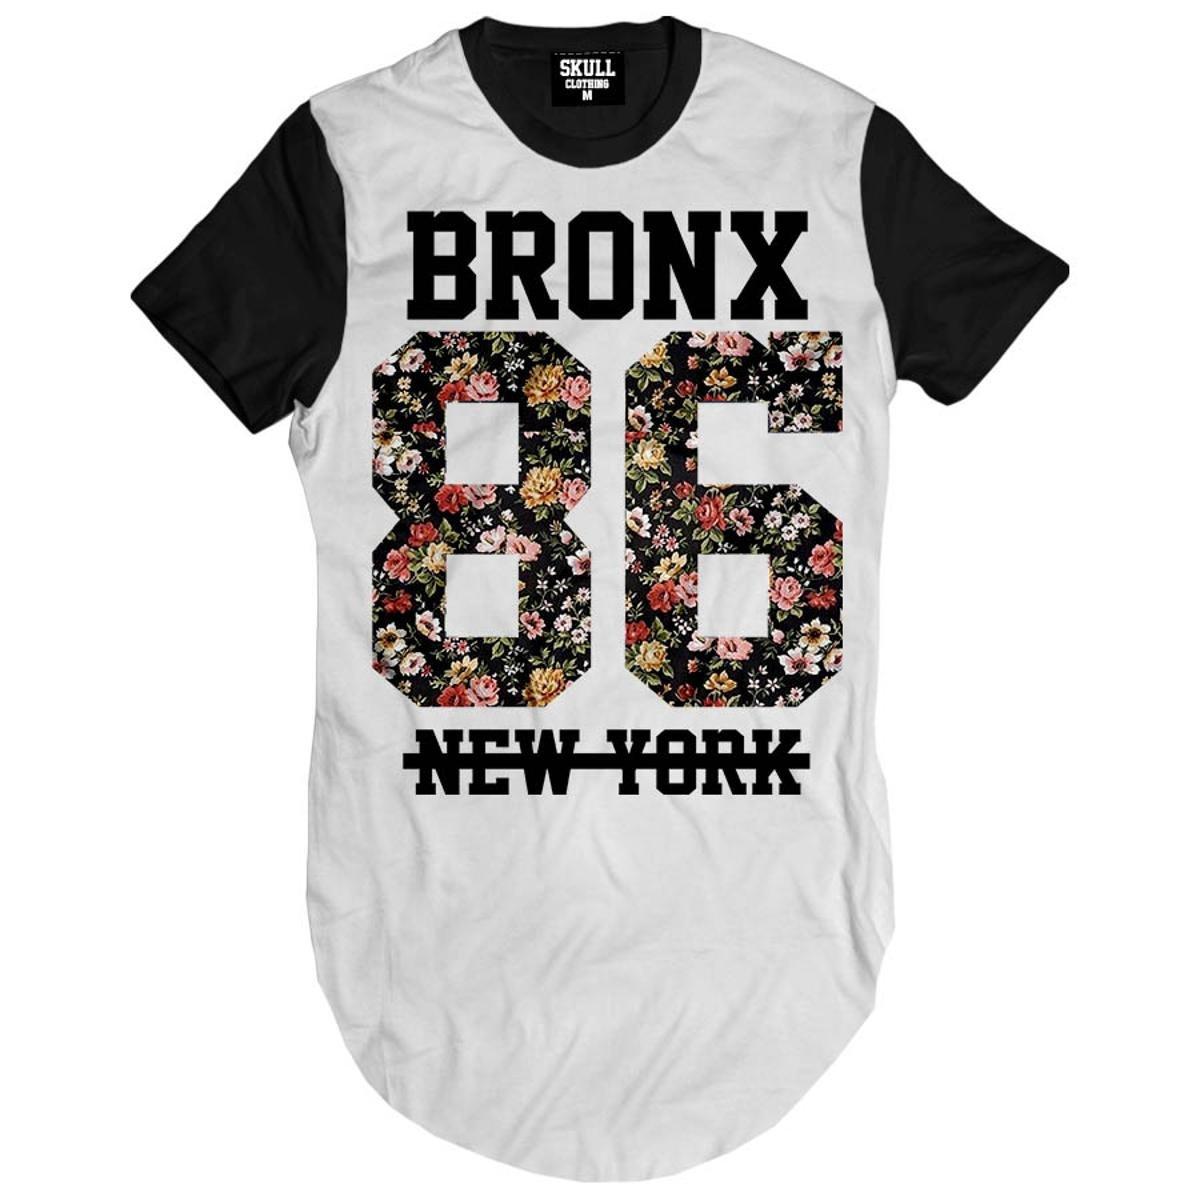 Camiseta Longline Bronx 86 New York